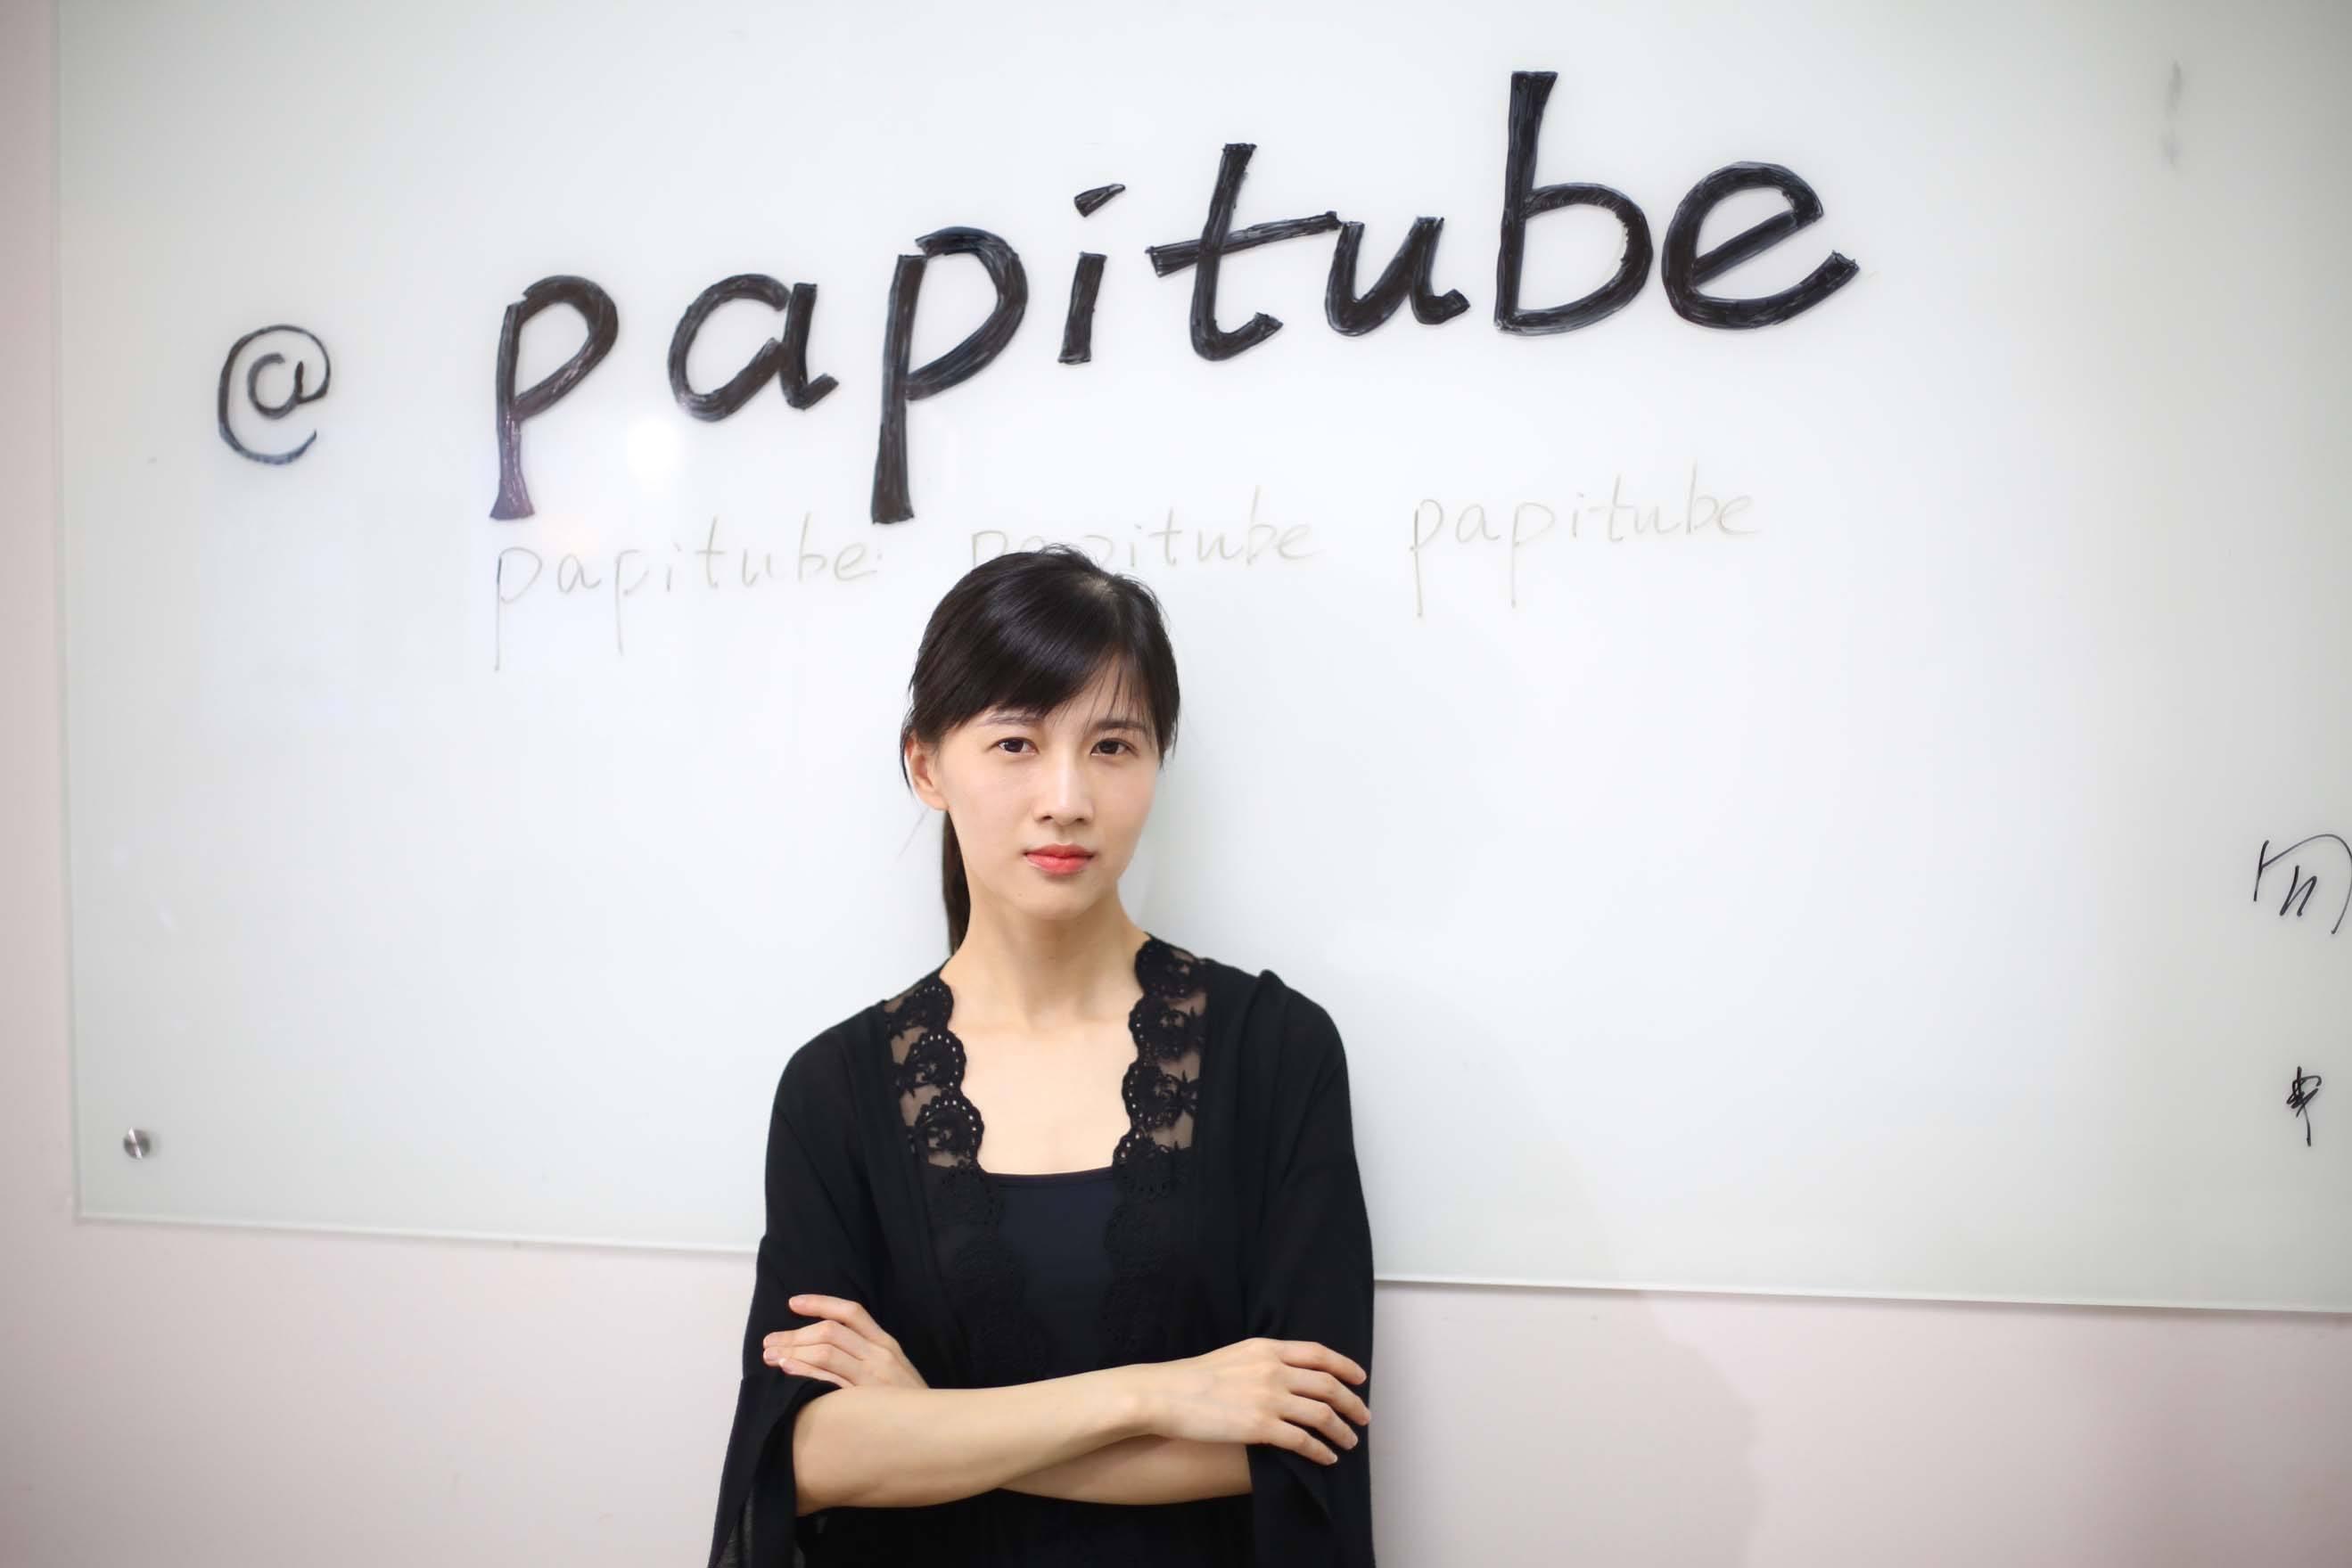 papitube两周年:再造一个papi酱是不是伪命题?